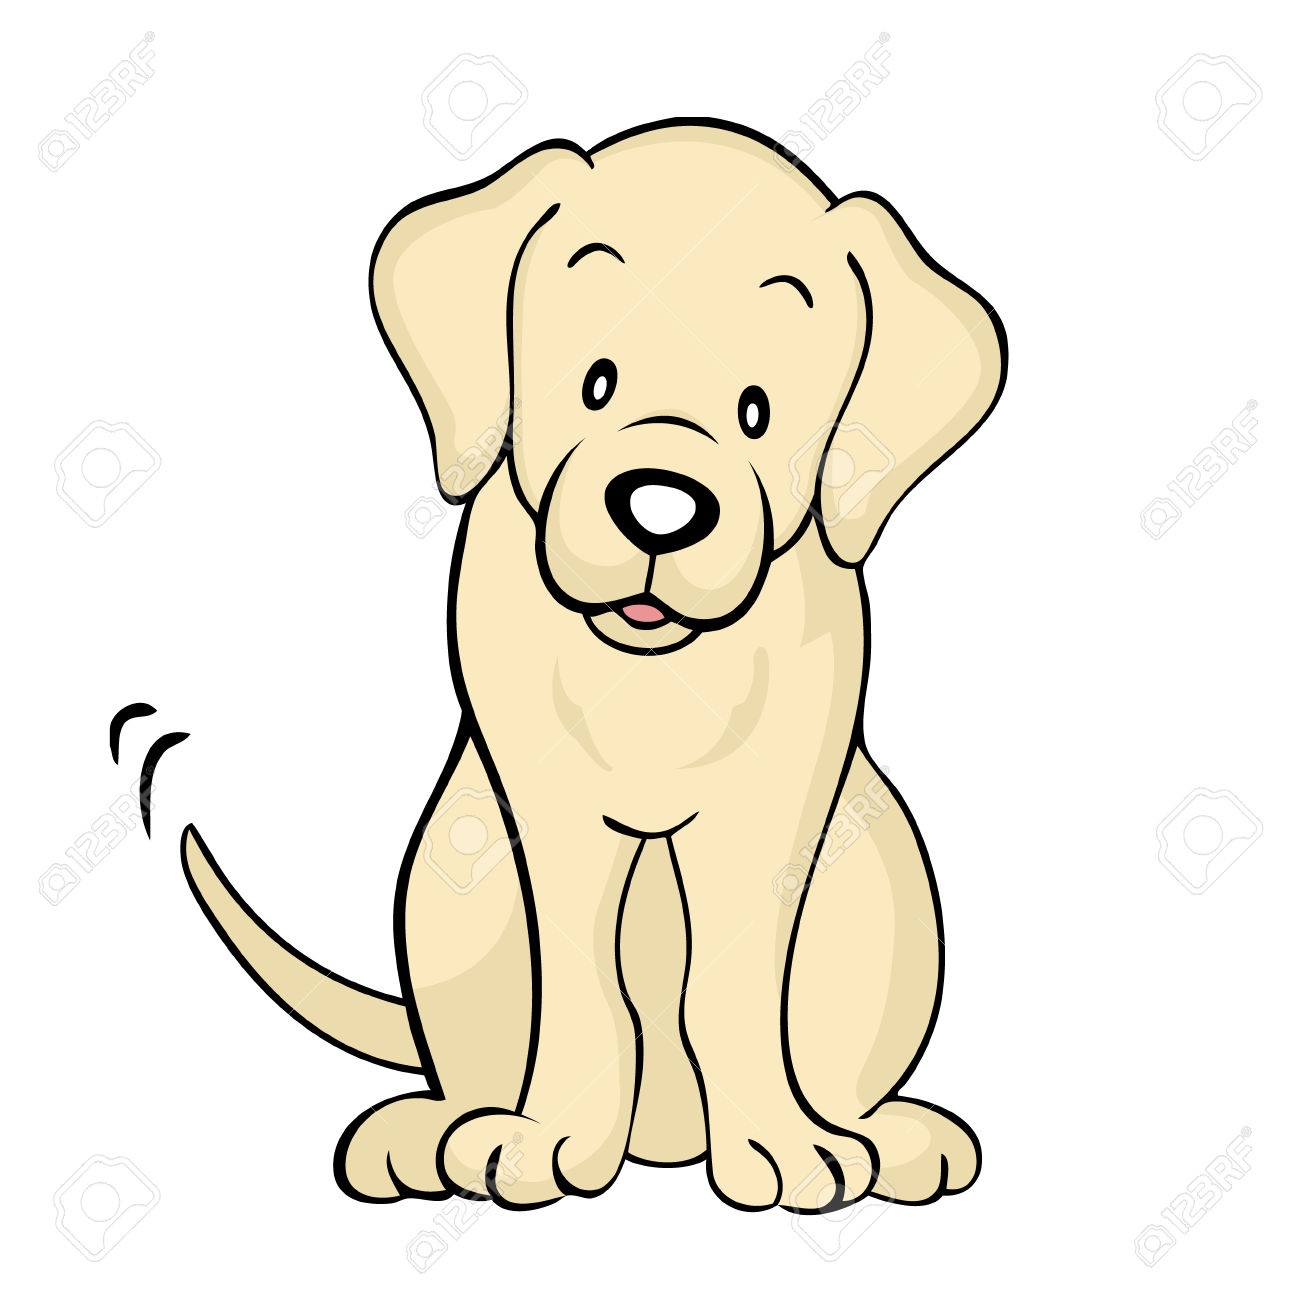 Clipart labador jpg Labrador puppy clipart - Cliparting.com jpg